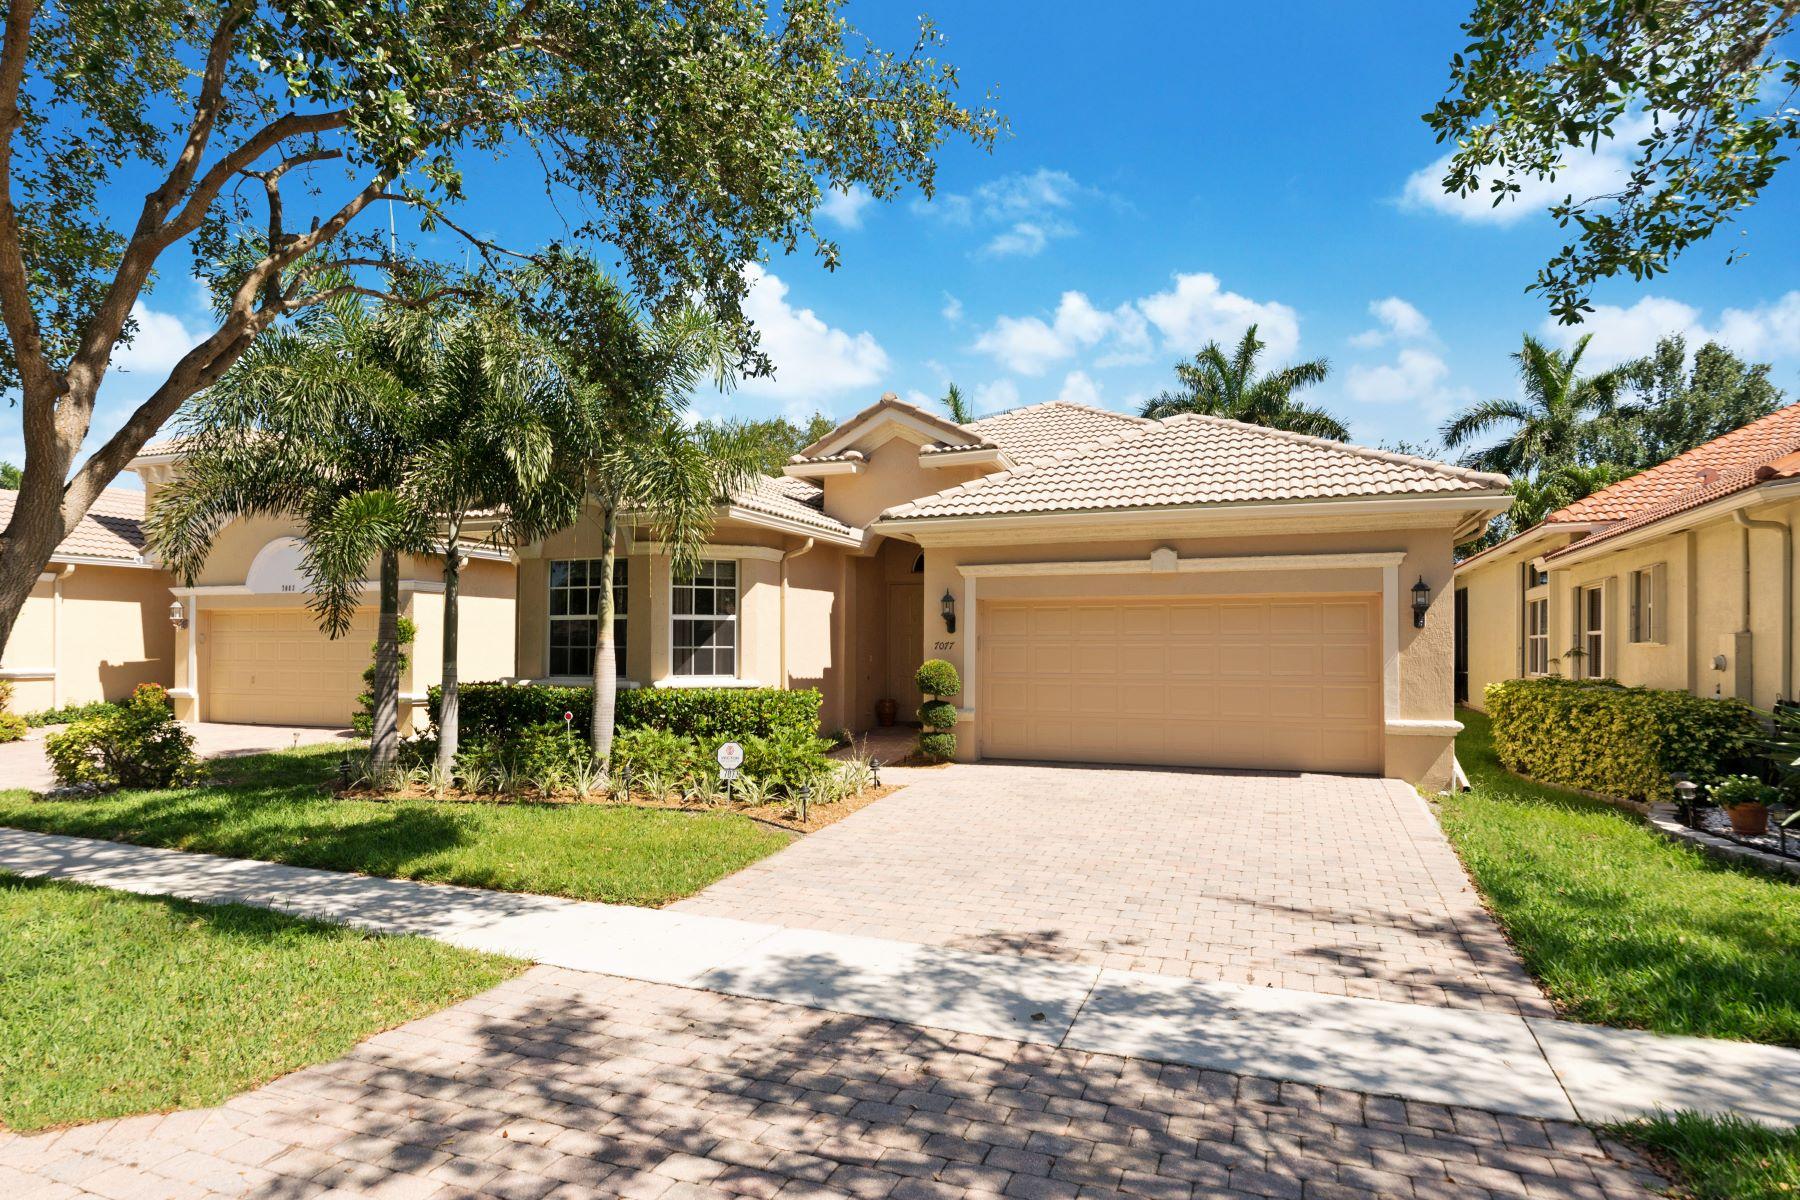 Single Family Home for Sale at 7077 Palazzo Reale Boynton Beach, Florida 33437 United States